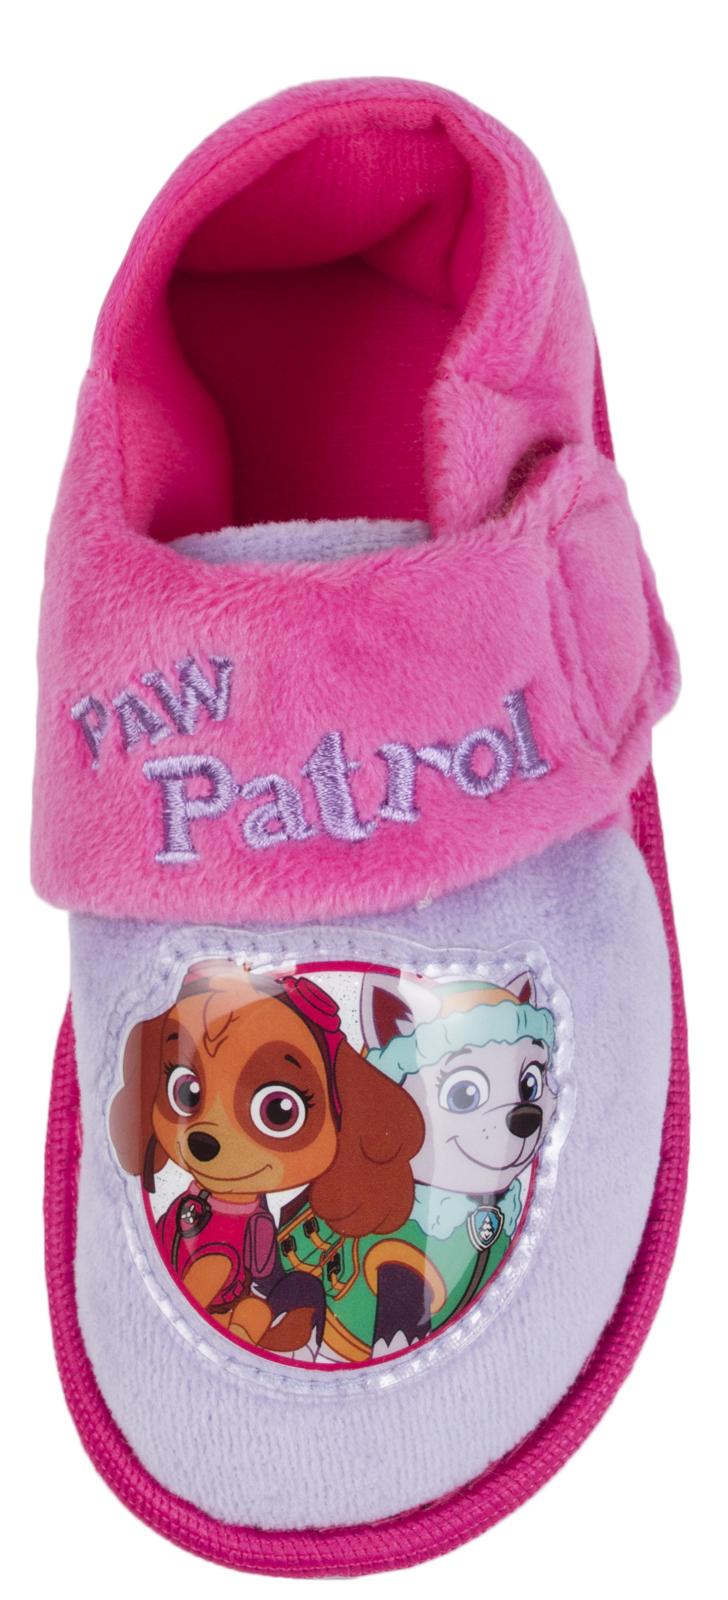 Chicas Paw Patrol Zapatillas carácter Skye Everest Velcro Botines Pantuflas Niños Talla